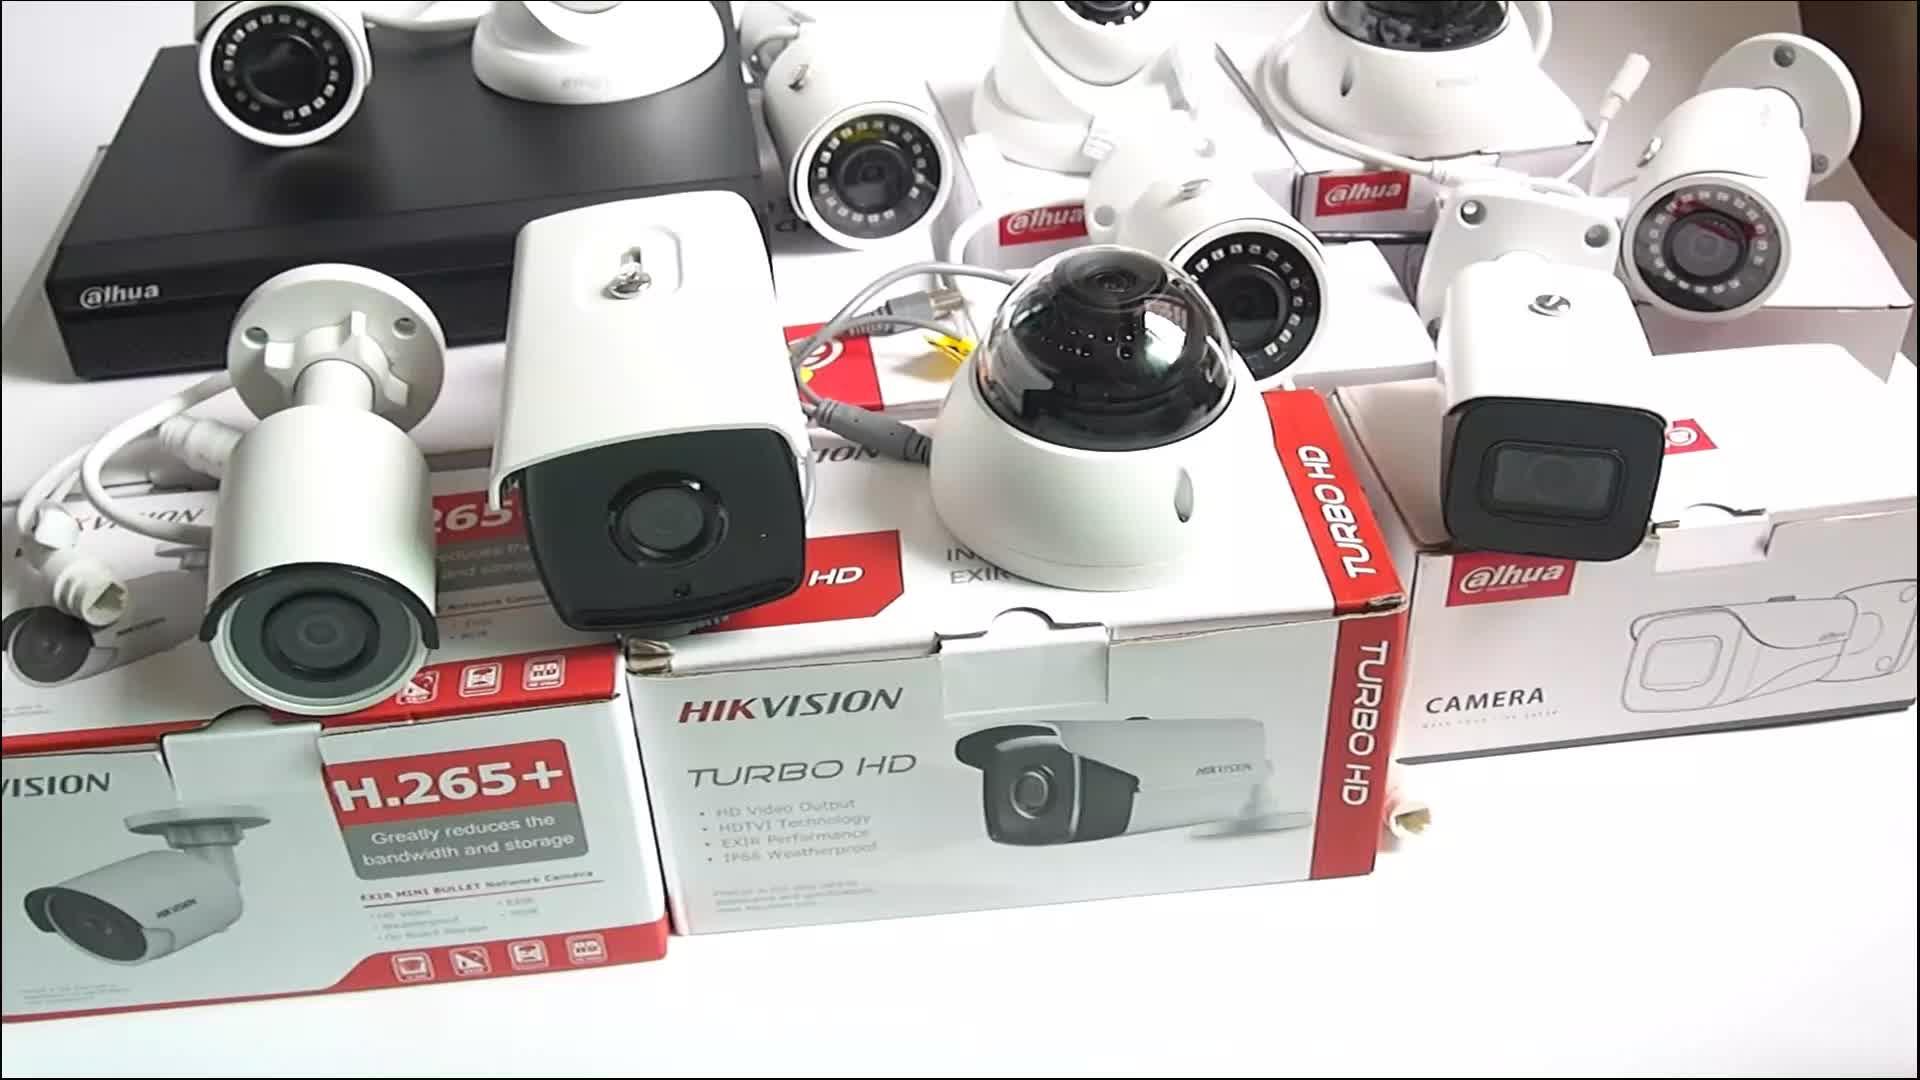 の Hikvision H.265 8CH フル Hd 4MP ターボ HD DVR サポート HDTVI/HDCVI/AHD/CVBS 入力 DS-7208HQHI-K1